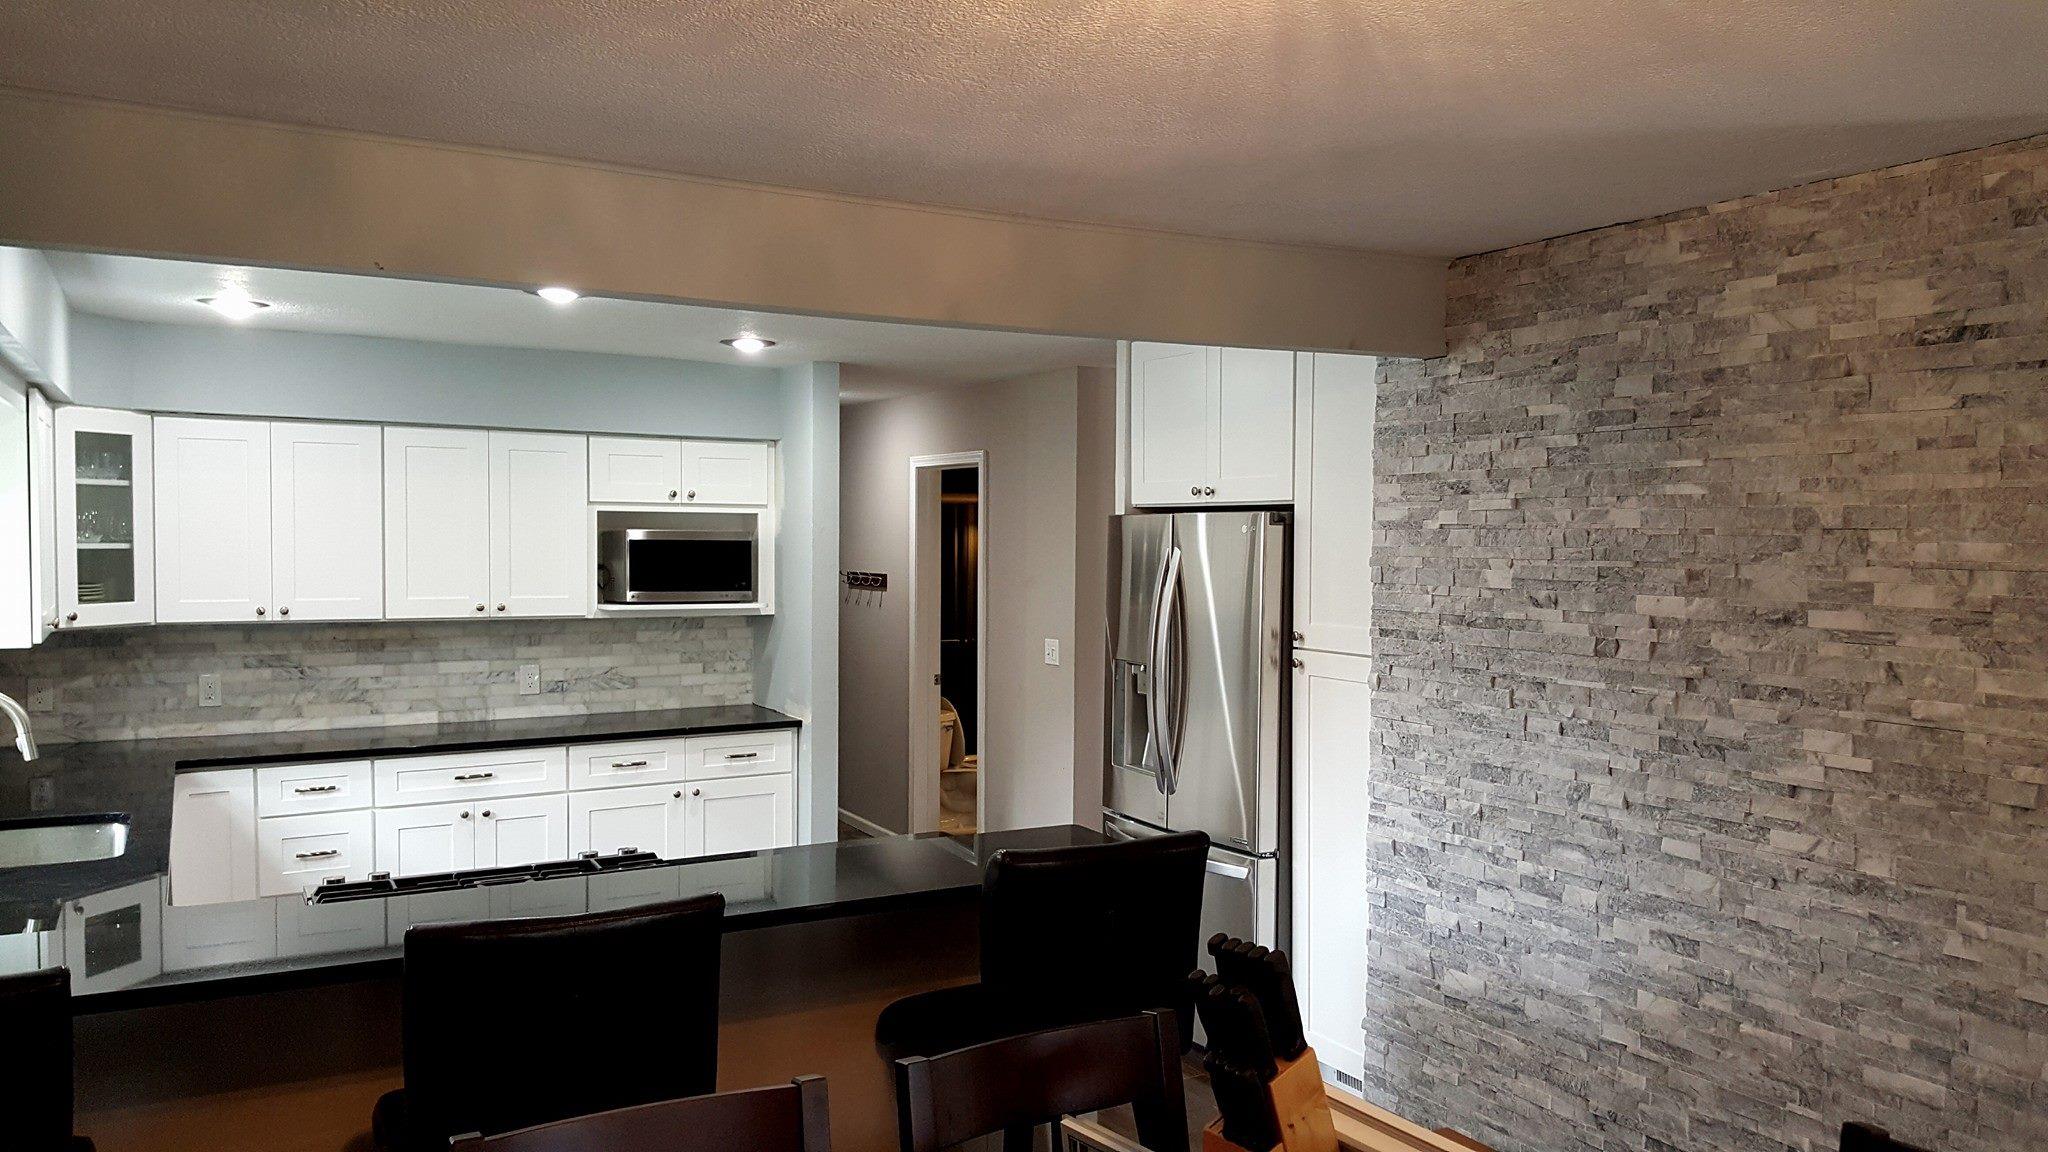 Clarkston Kitchen Renovation